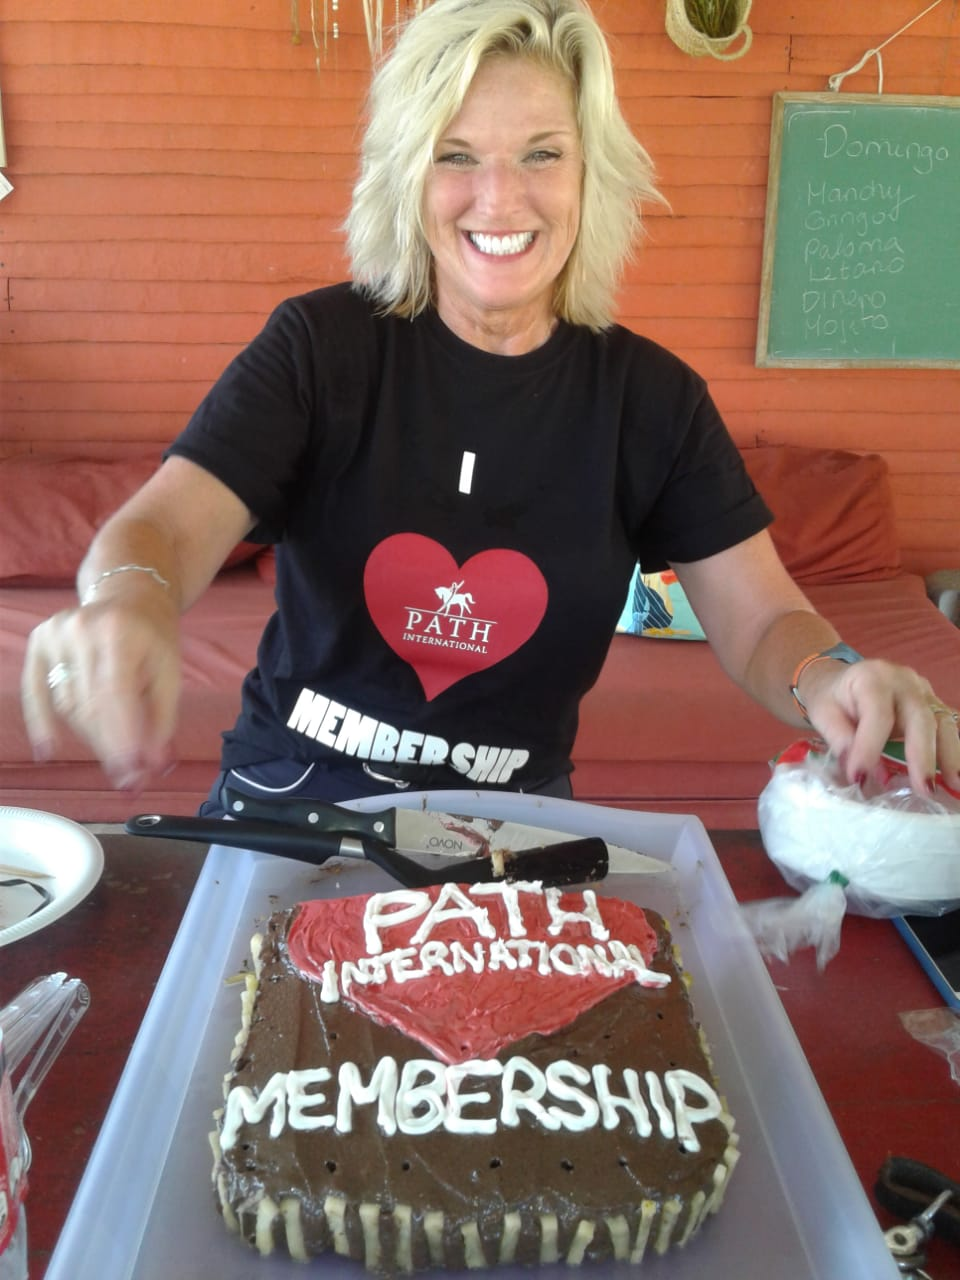 Ruth Claus with PATH Intl. Membership cake